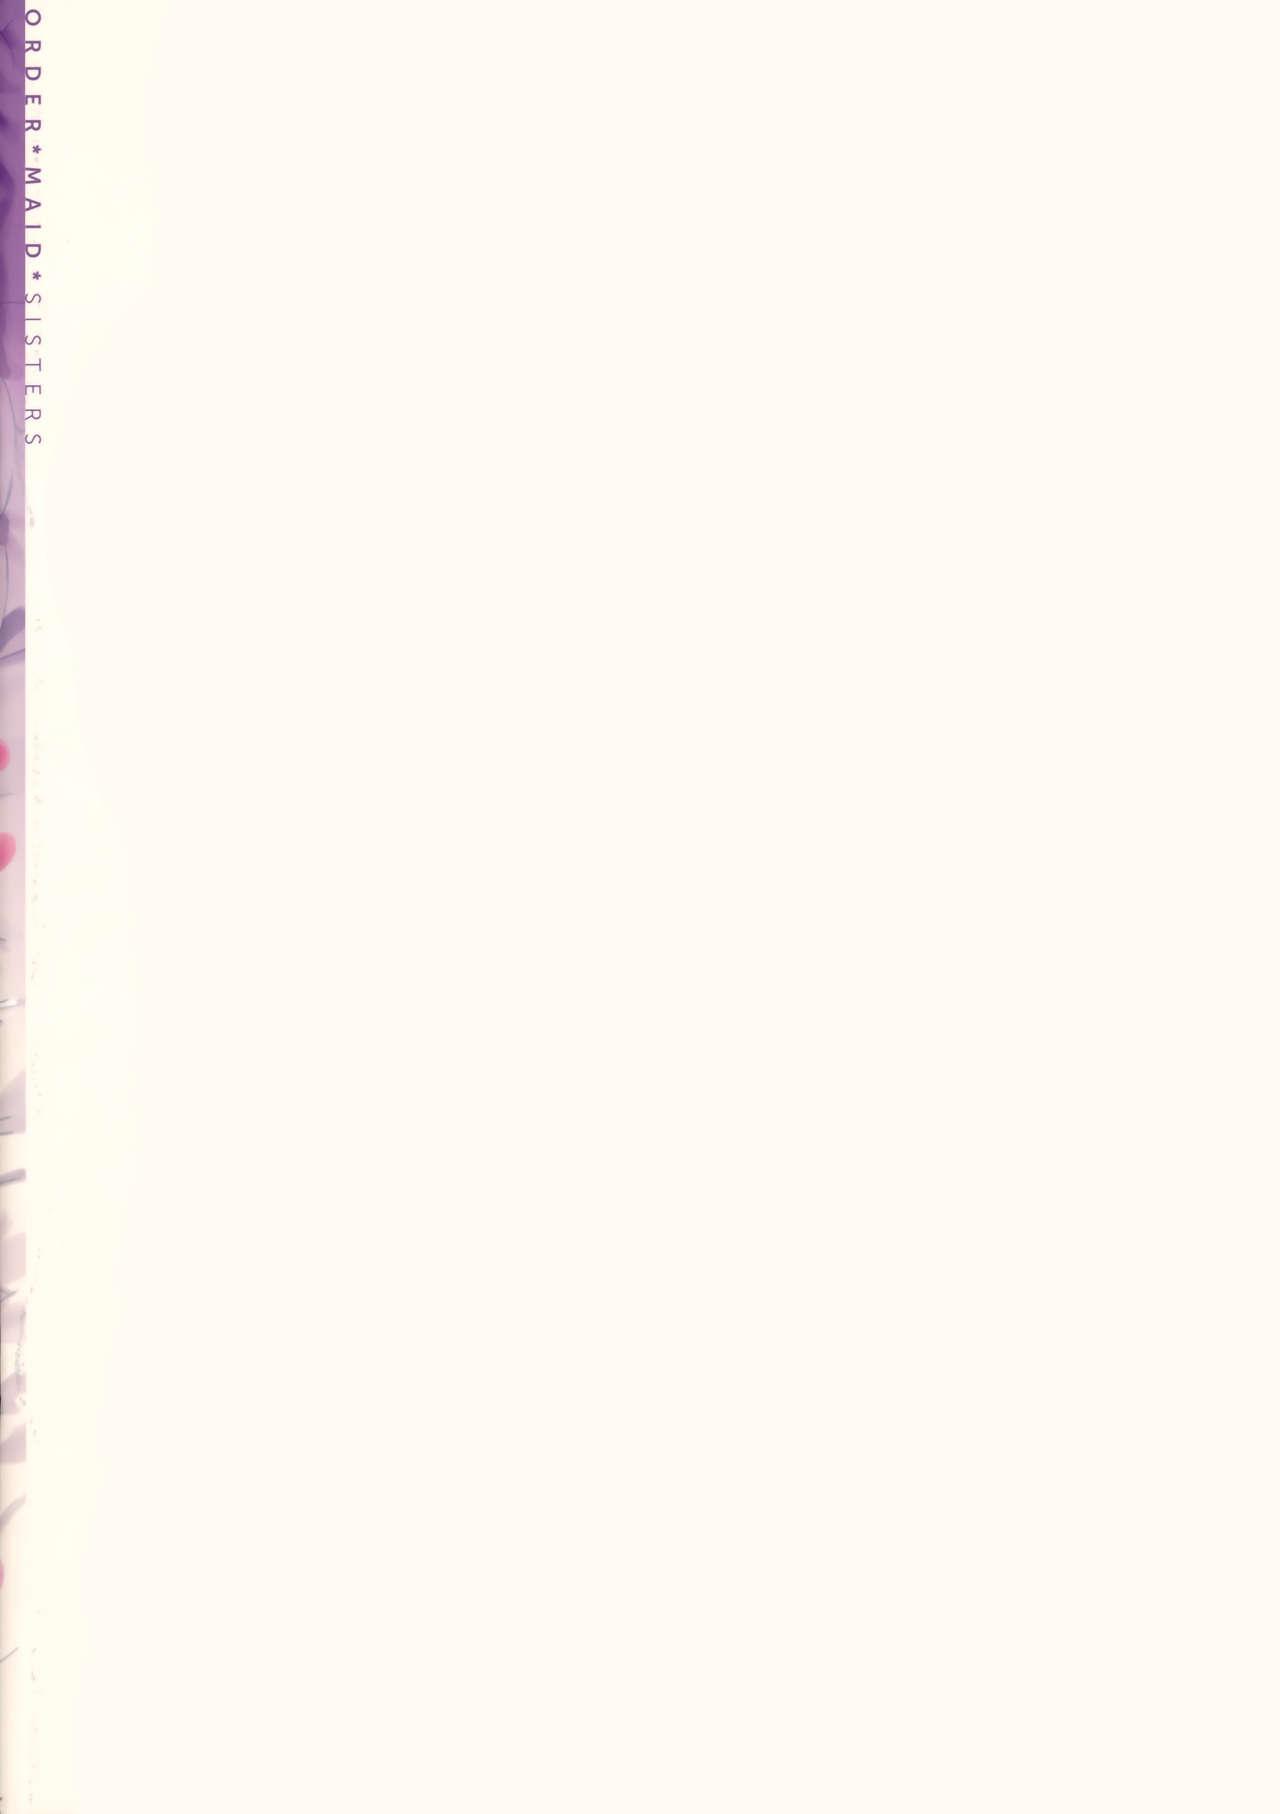 ORDER*MAID*SISTERS Jougasaki Shimai to Maid SEX Suru Hon   ORDER*MAID*SISTERS - A book about having maid sex with the Jougasaki Sisters 28